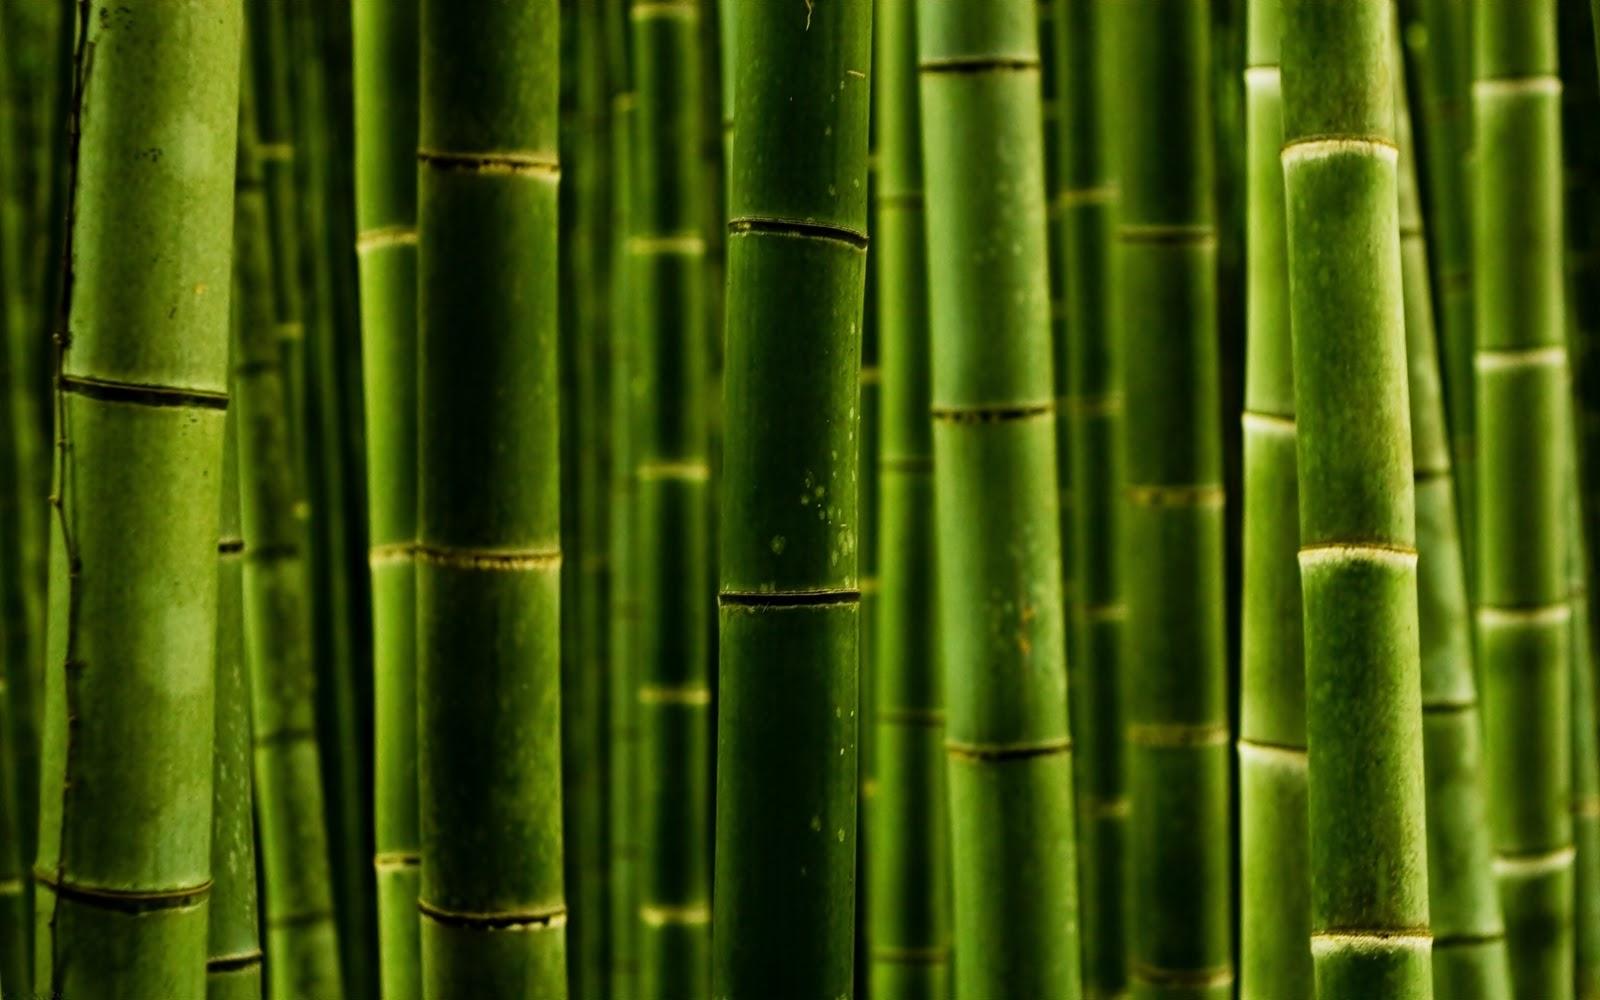 http://4.bp.blogspot.com/-wbPLQ2xgmZ4/TqGElCL_LMI/AAAAAAAAD1I/zOZYMt3E360/s1600/bambus.jpg